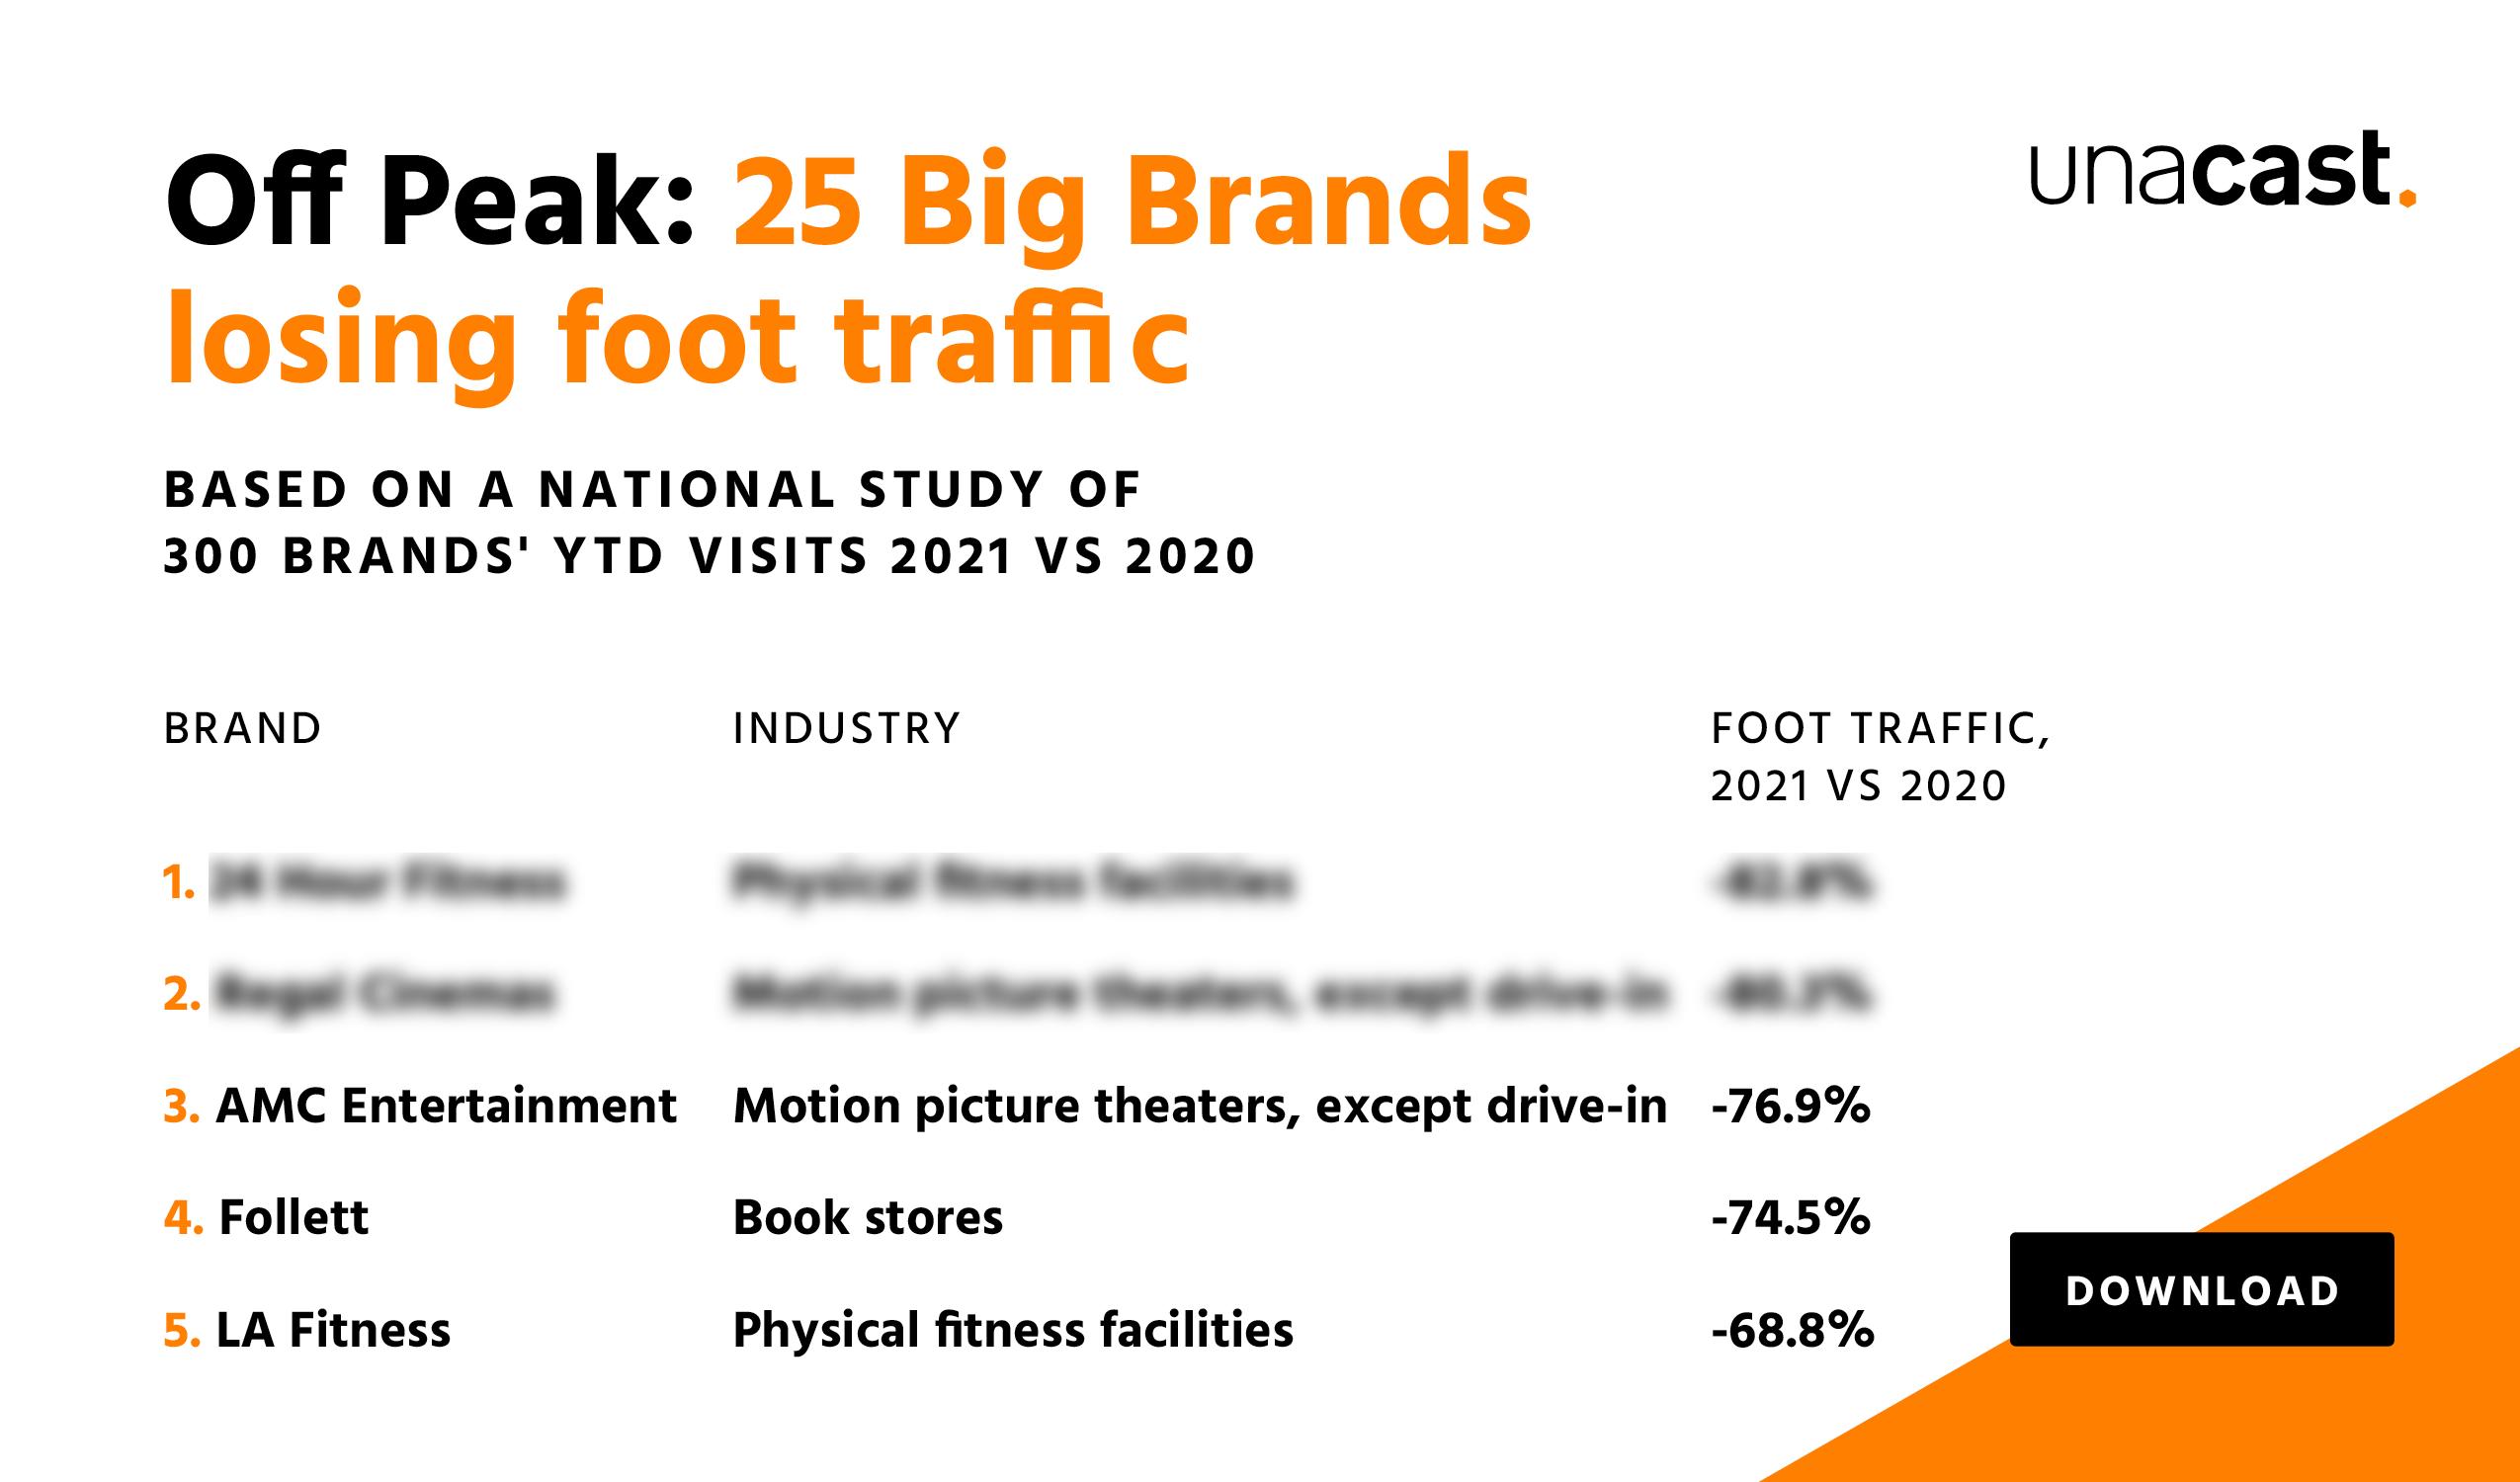 25 Big Brands losing foot traffic